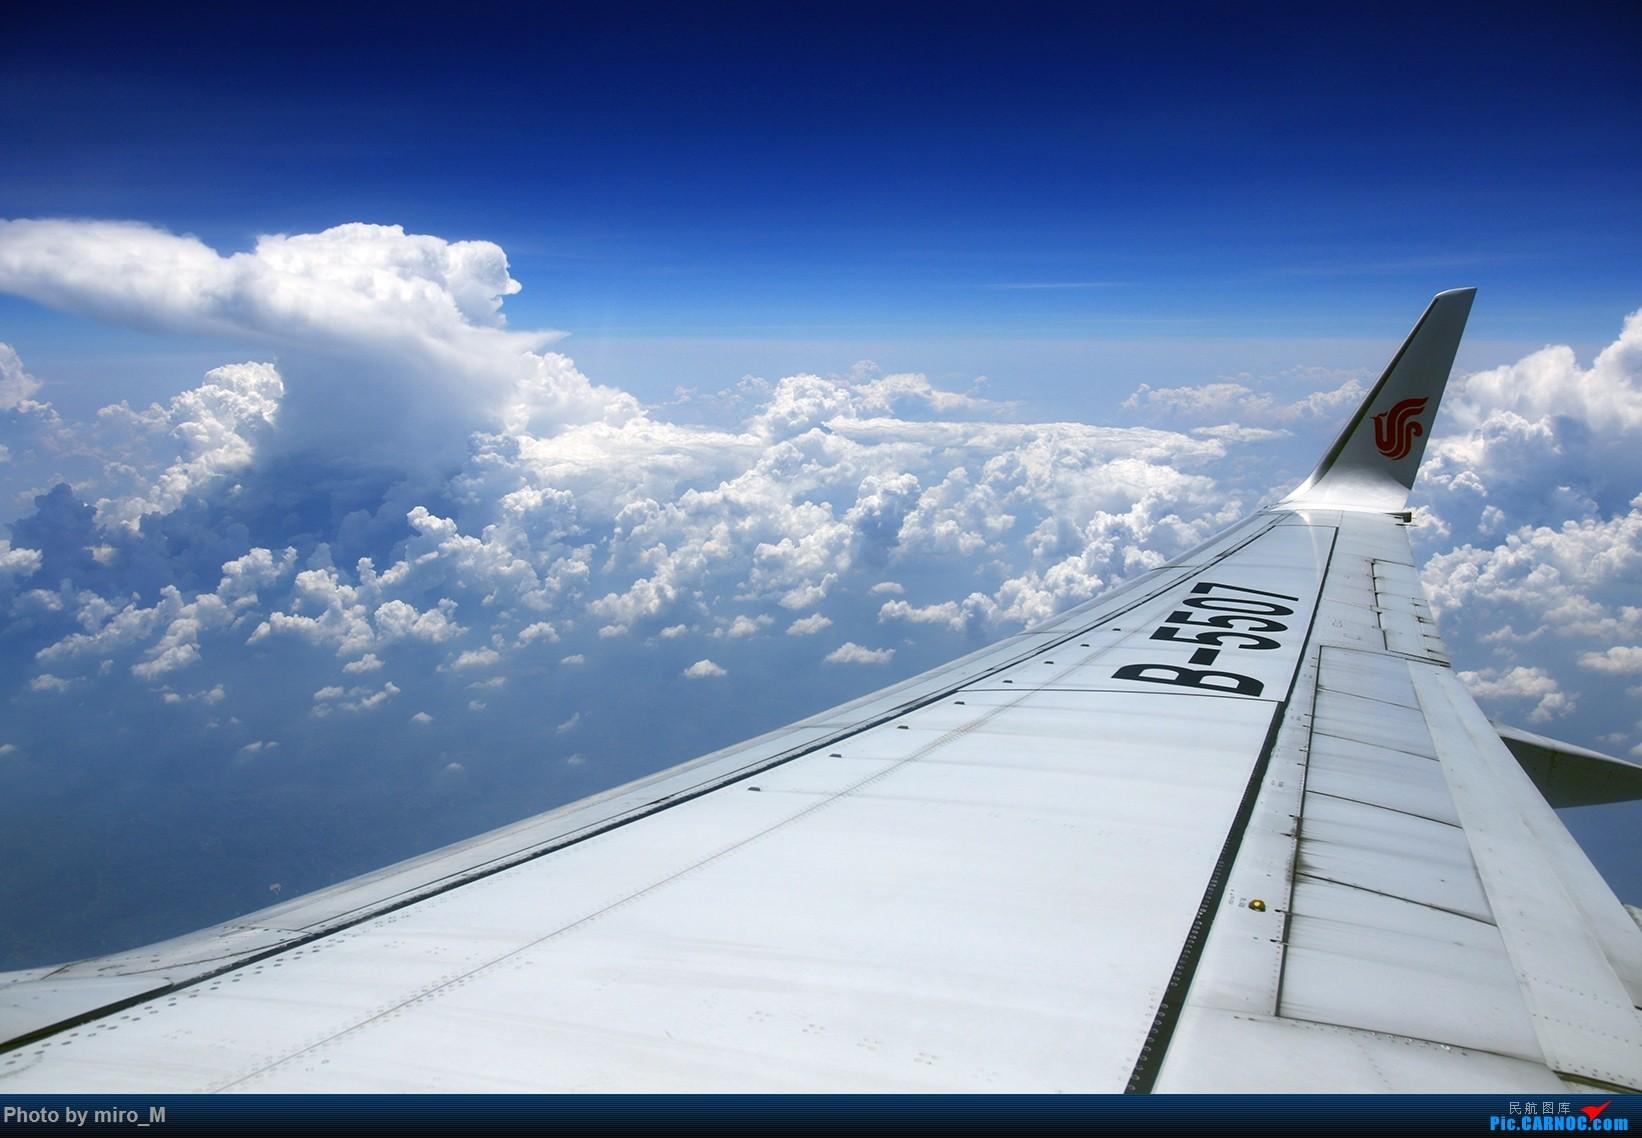 Re:[原创]欧洲浪了一圈,CS100,BAE146,fokker70等新老机型串着飞+ZRH,MUC,FRA,AMS,TLS拍机 BOEING 737-800 B-5507 中国西安咸阳国际机场